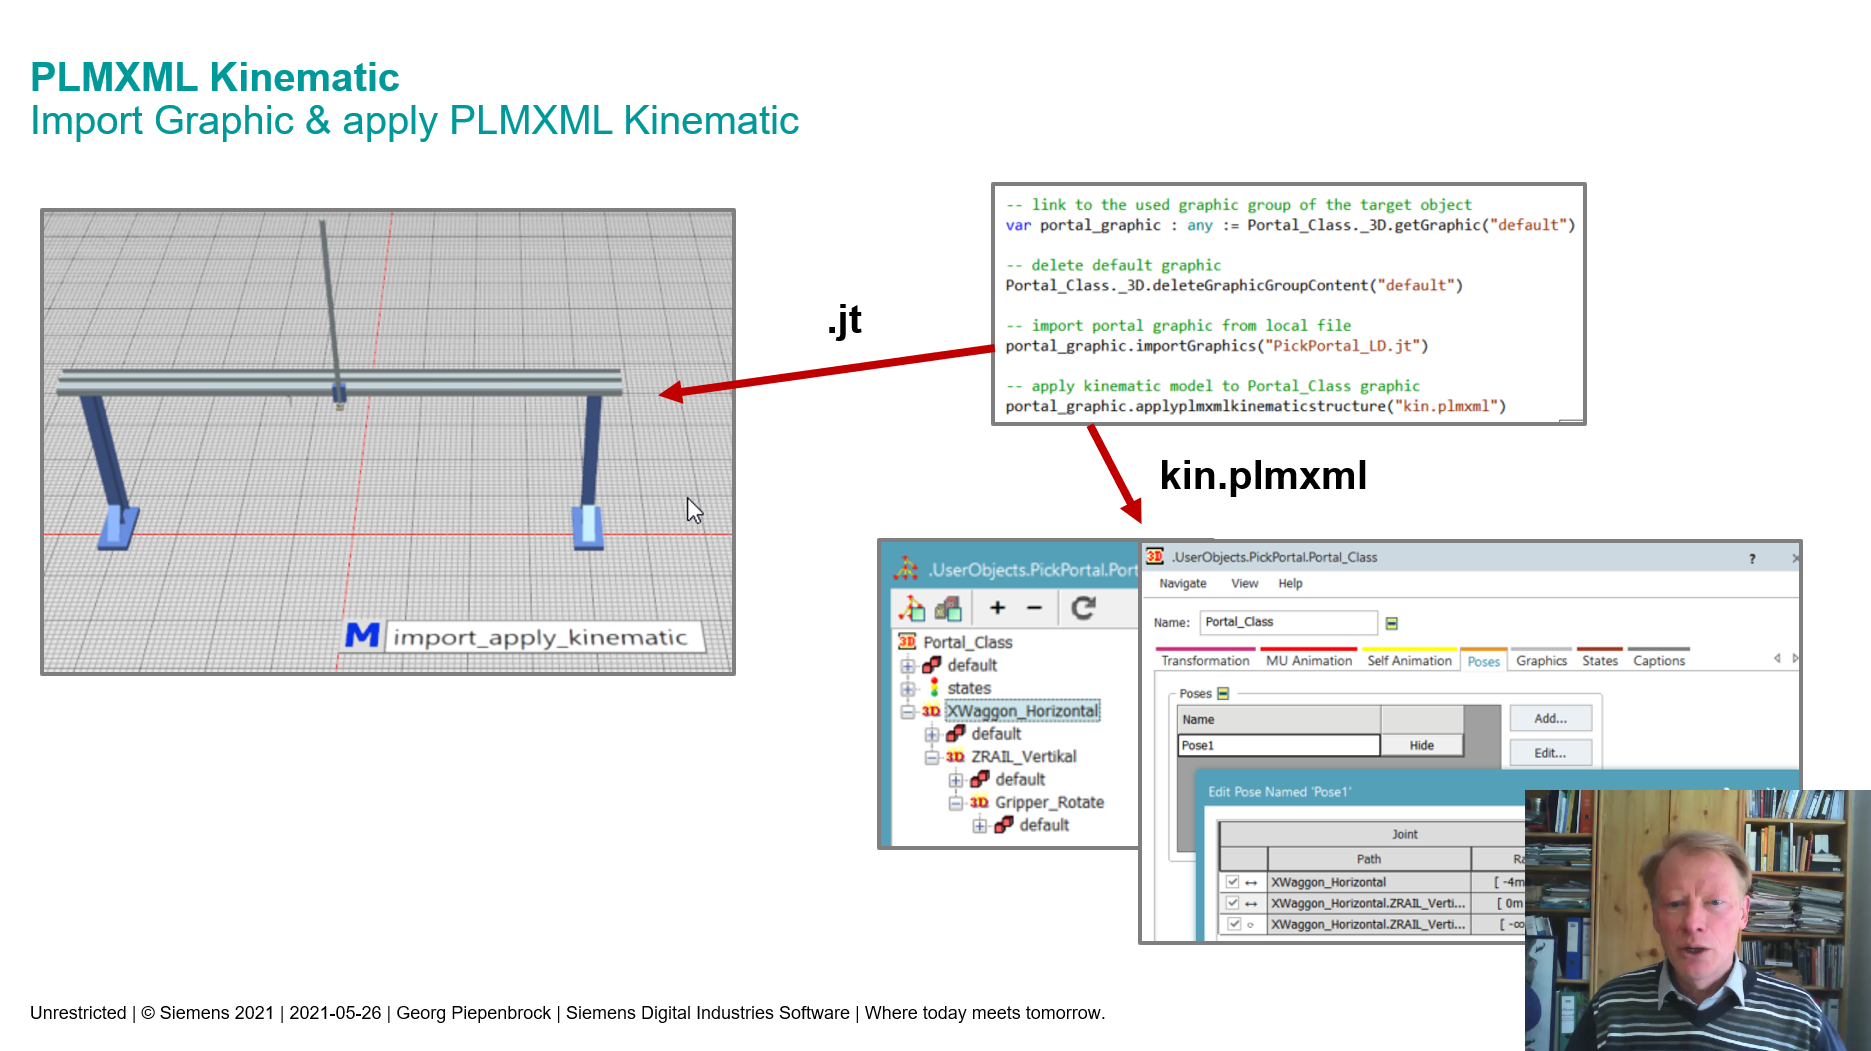 PLMXML Kinematic Import Graphic & apply PLMXML Kinematic